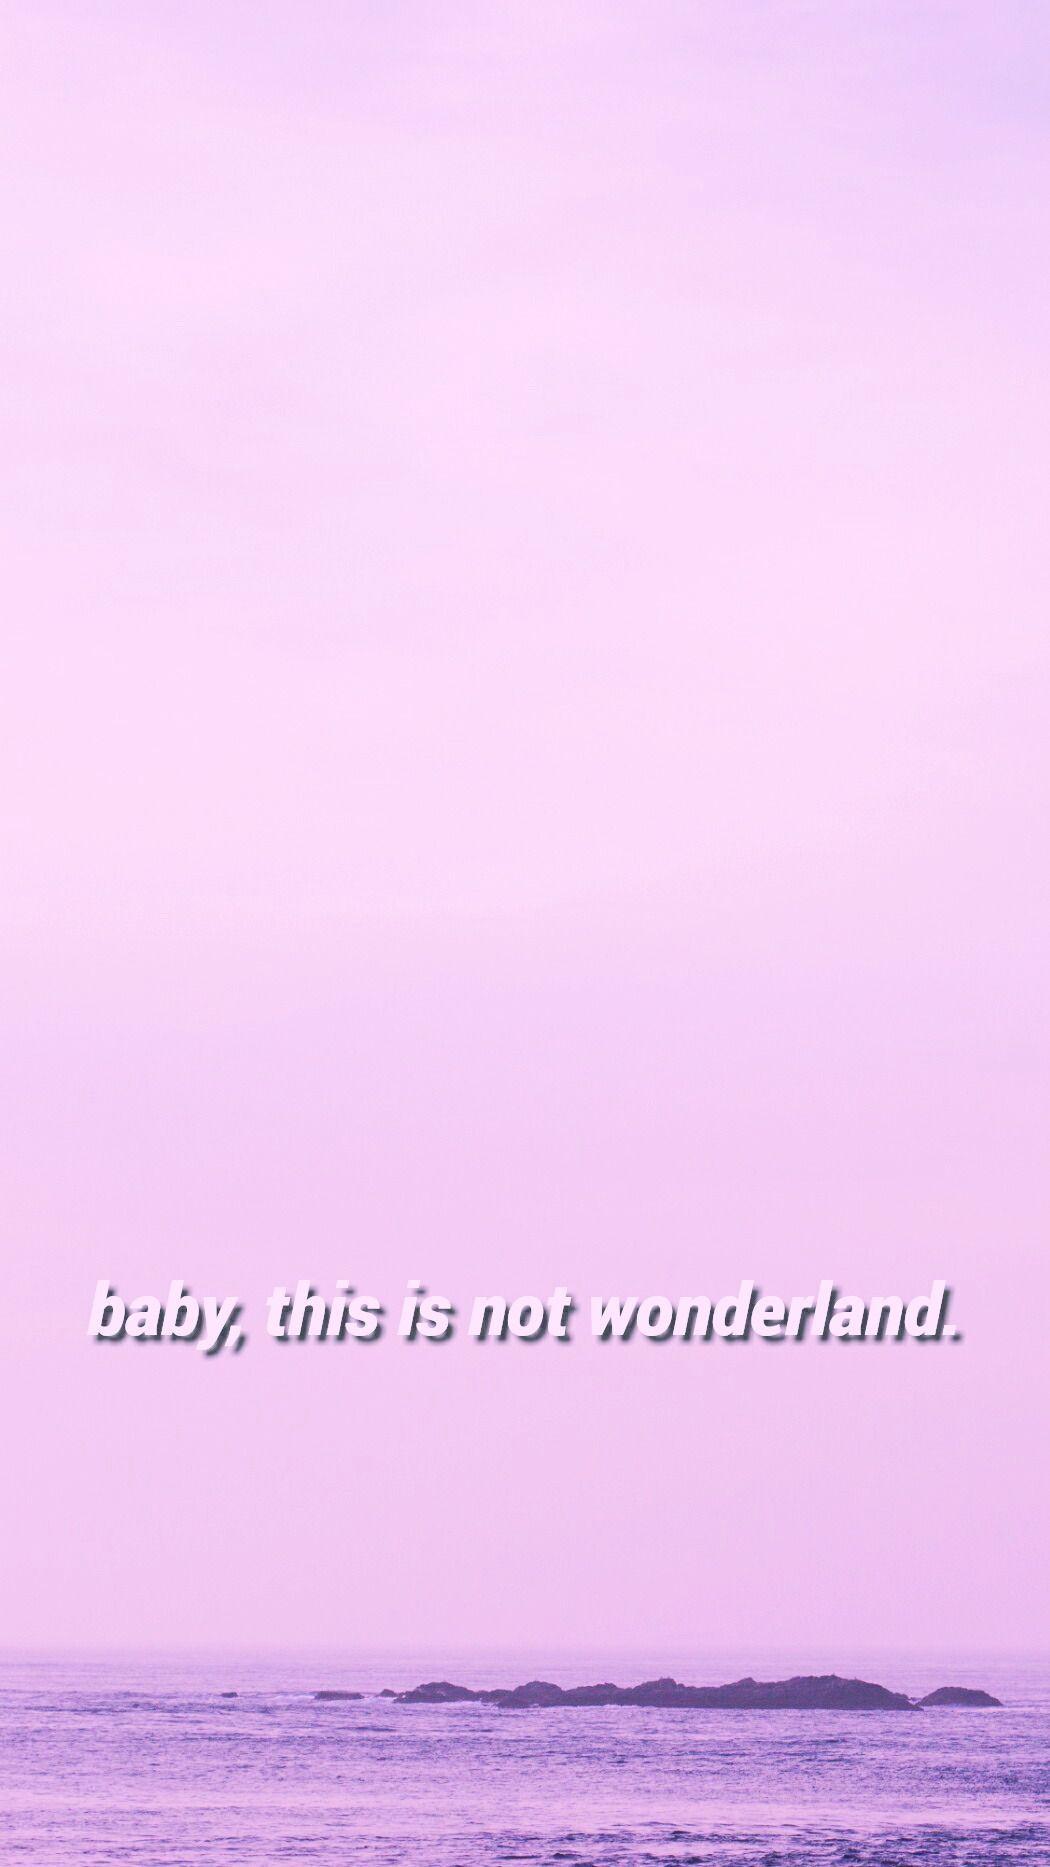 Grunge Soft Pink Aesthetic Background Cuteanimals In 2020 Pastel Aesthetic Aesthetic Backgrounds Aesthetic Grunge Tumblr